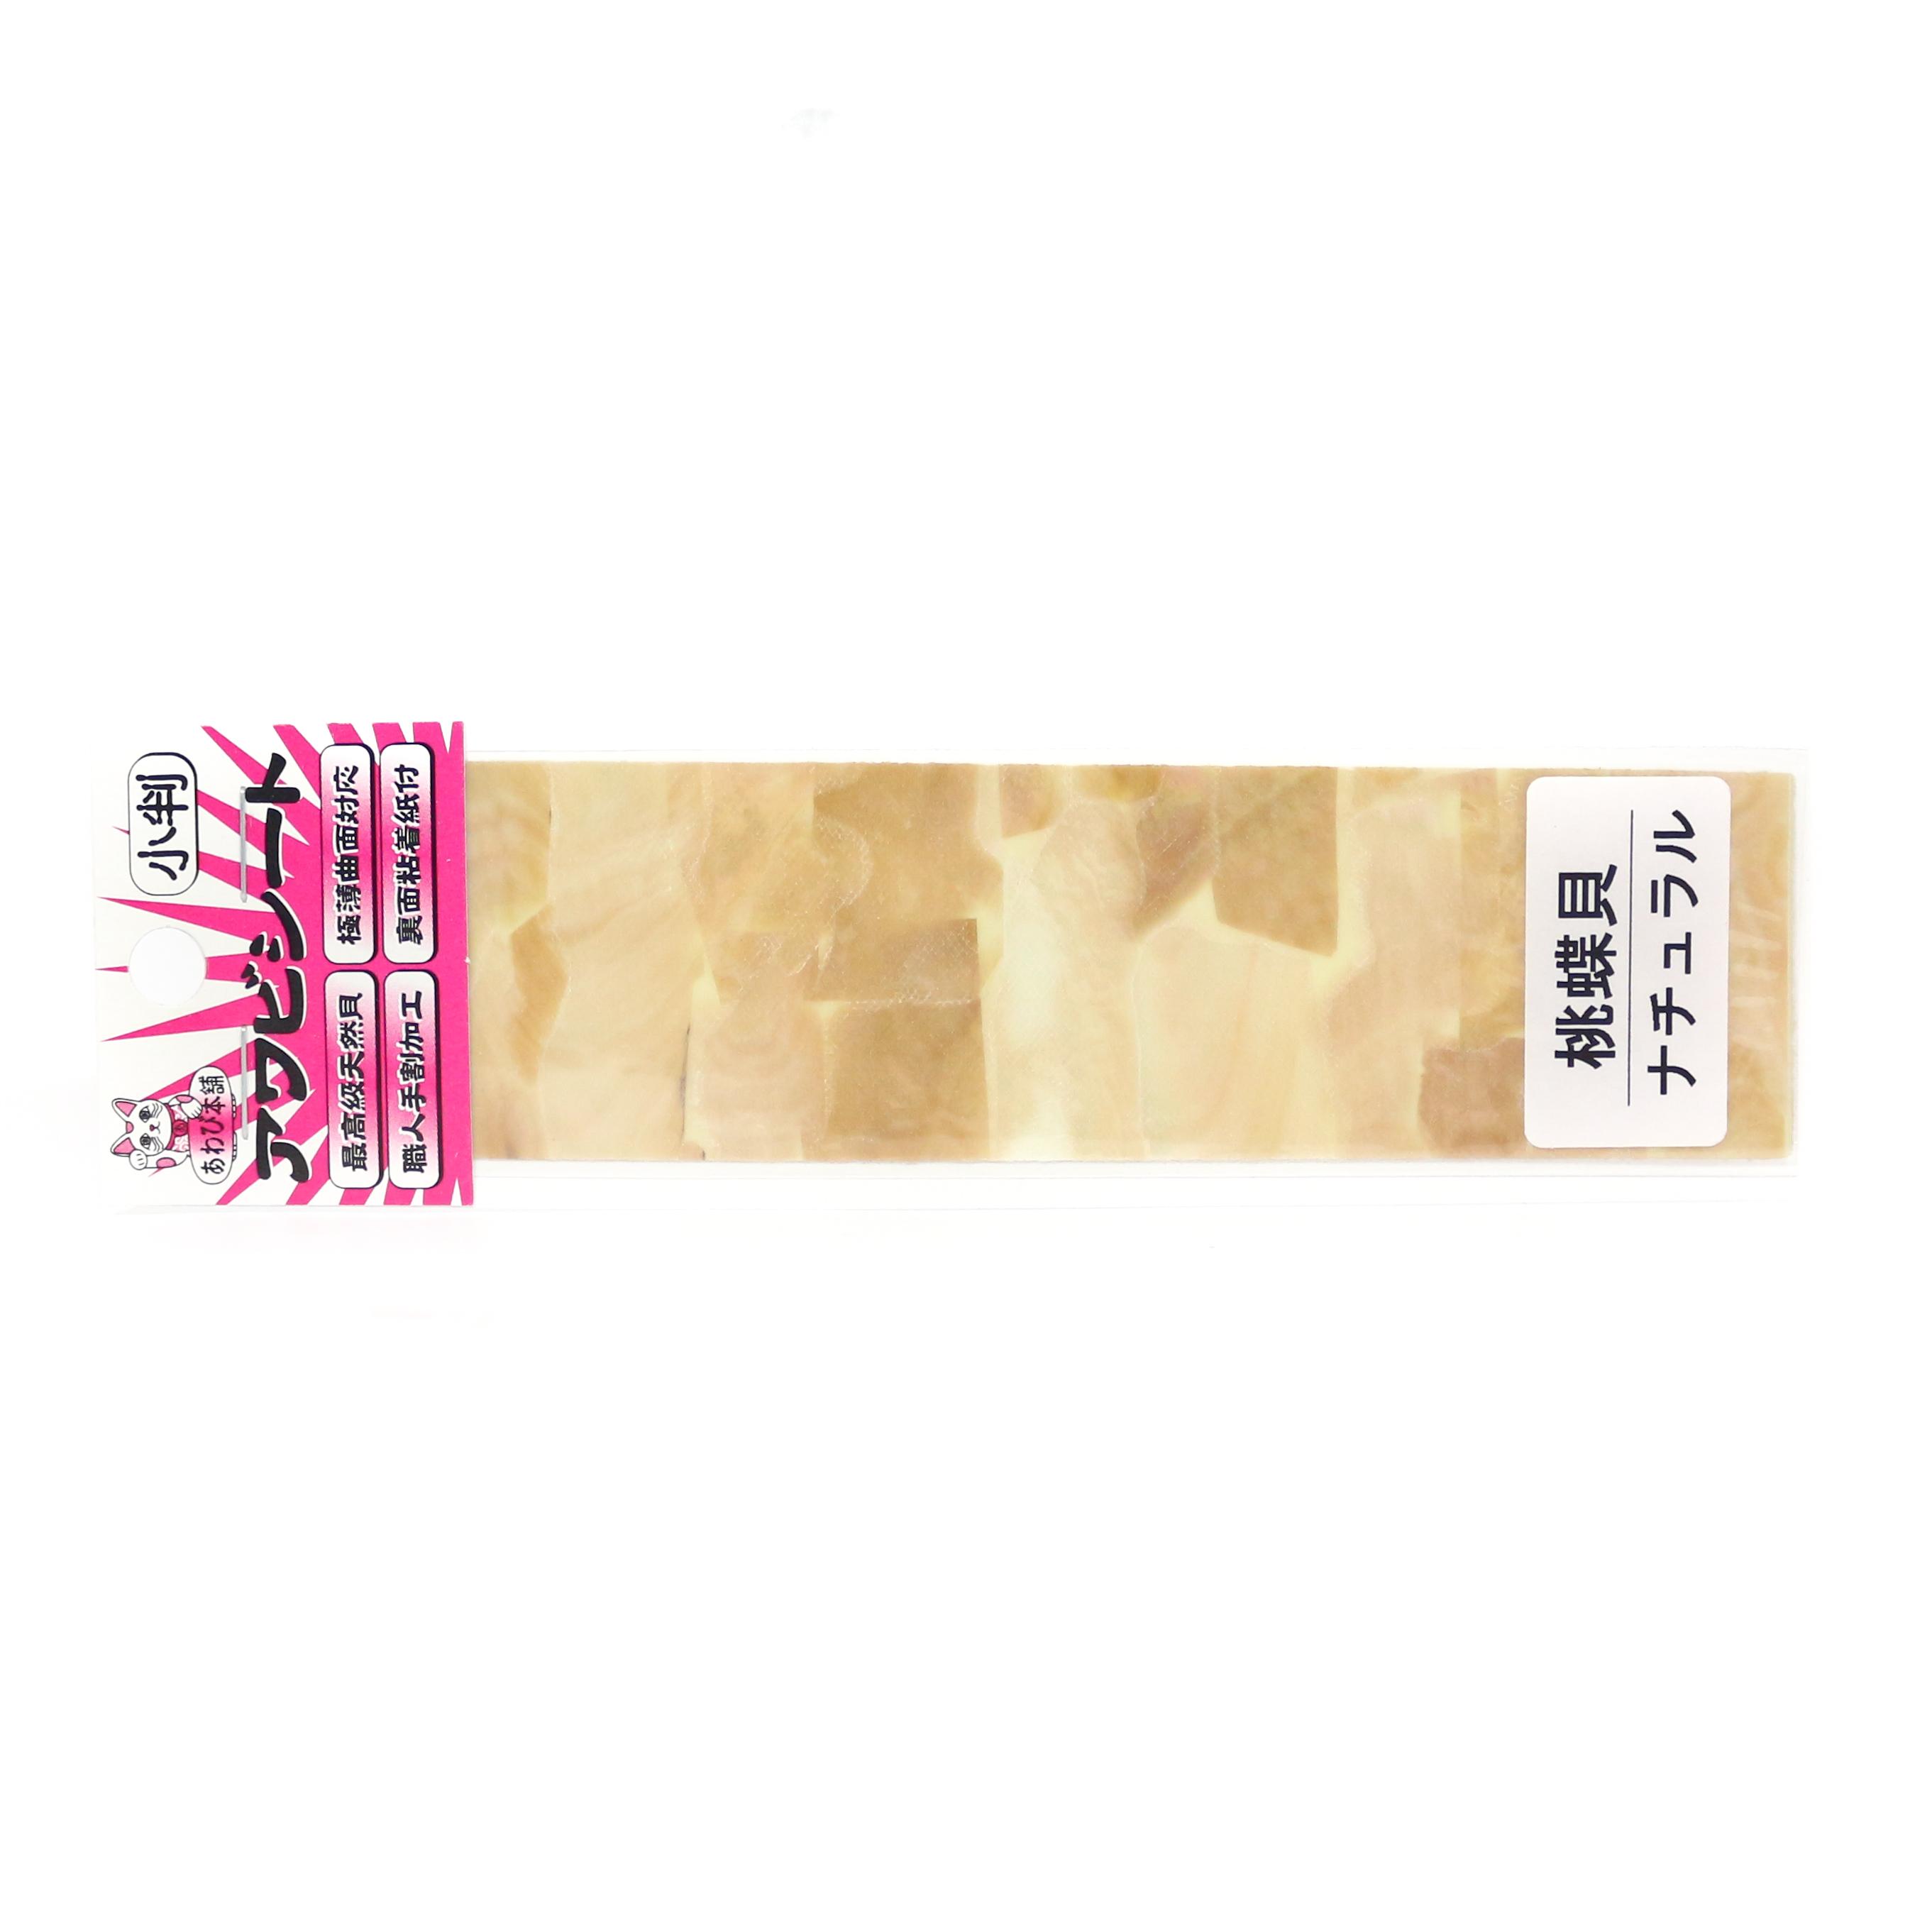 Awabi Honpo Awabi Sheet Momochokai Size S 40 x 140 mm Natural (3591)